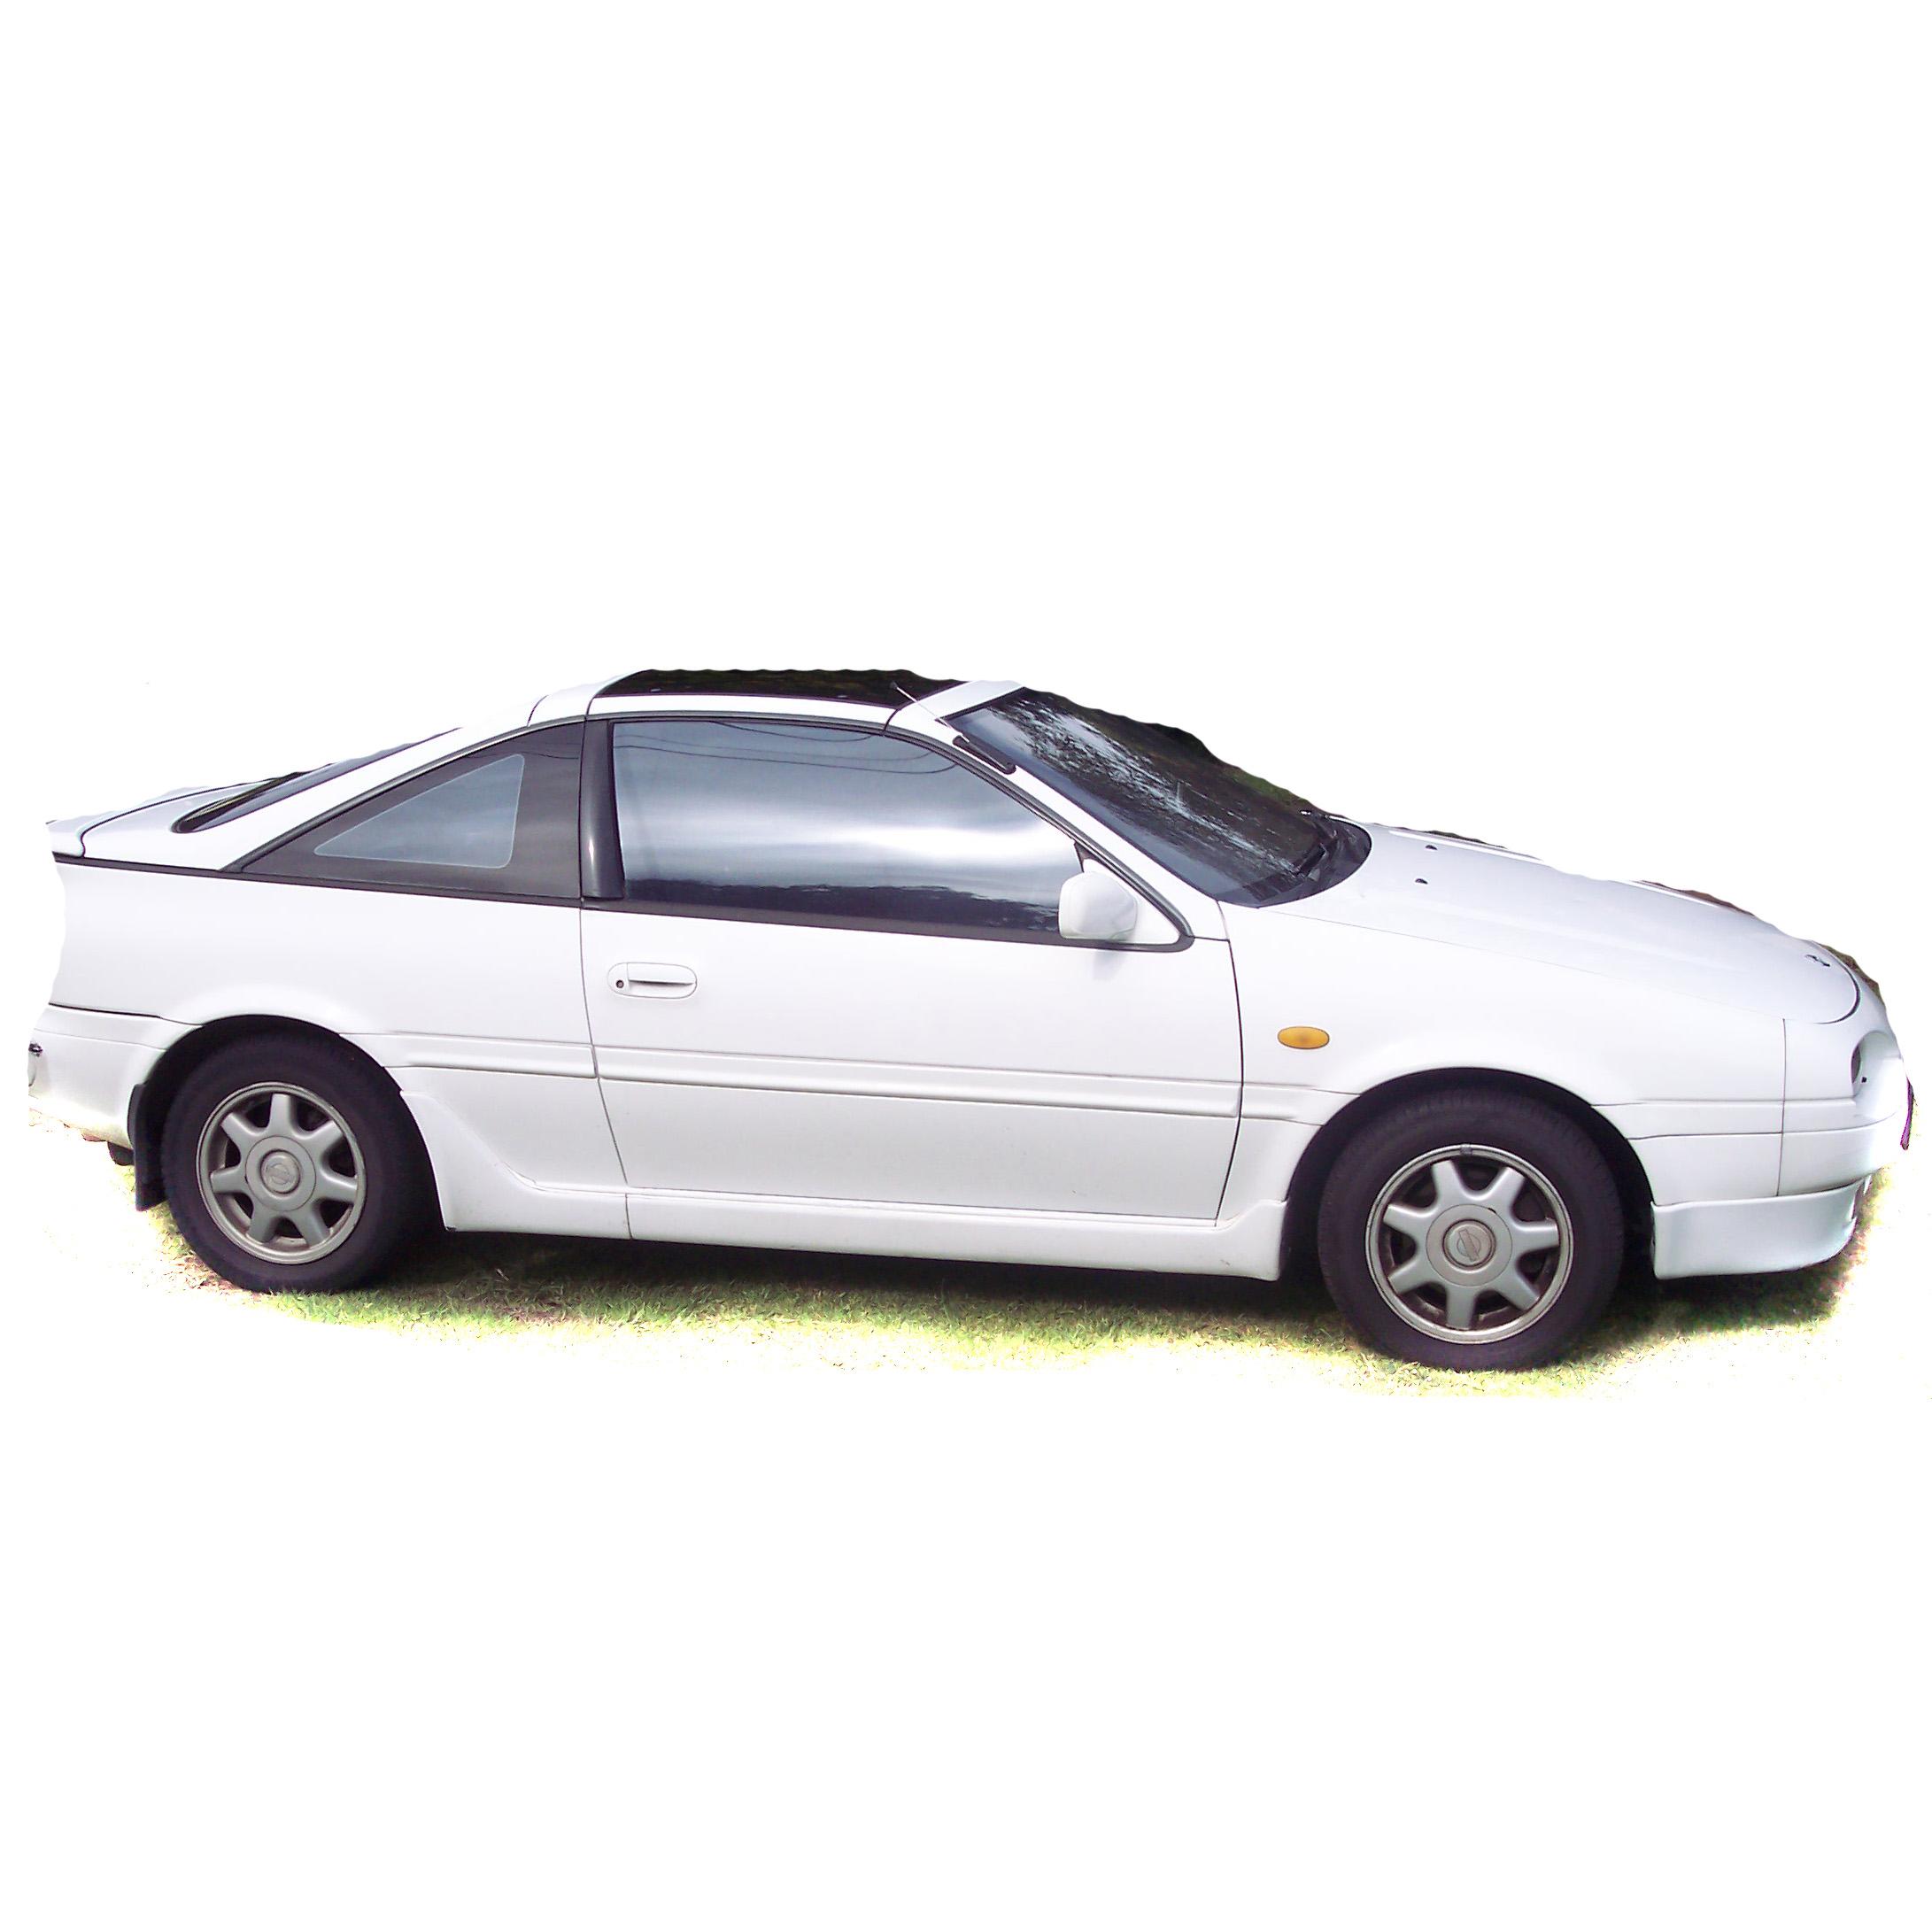 Nissan 100 NX 1991-1996